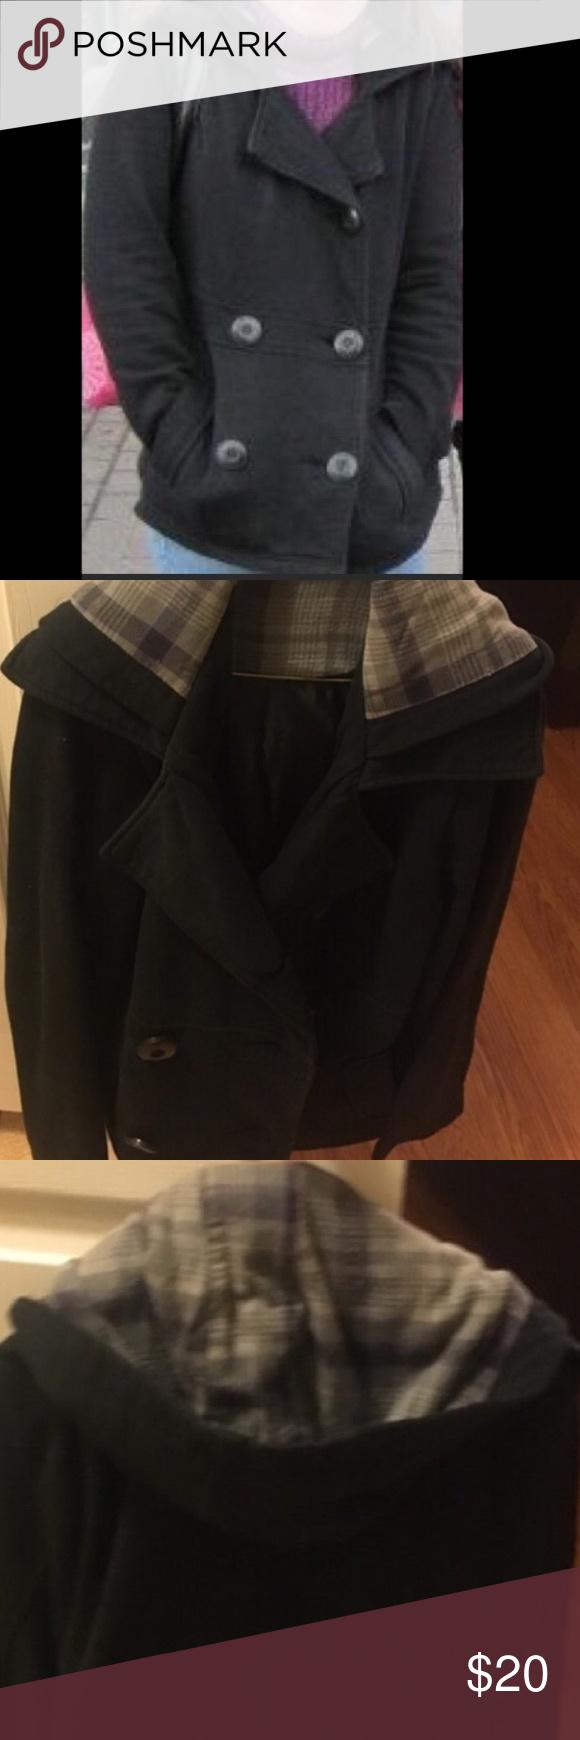 Black pea coat with hood Black pea coat with good Jackets & Coats Pea Coats